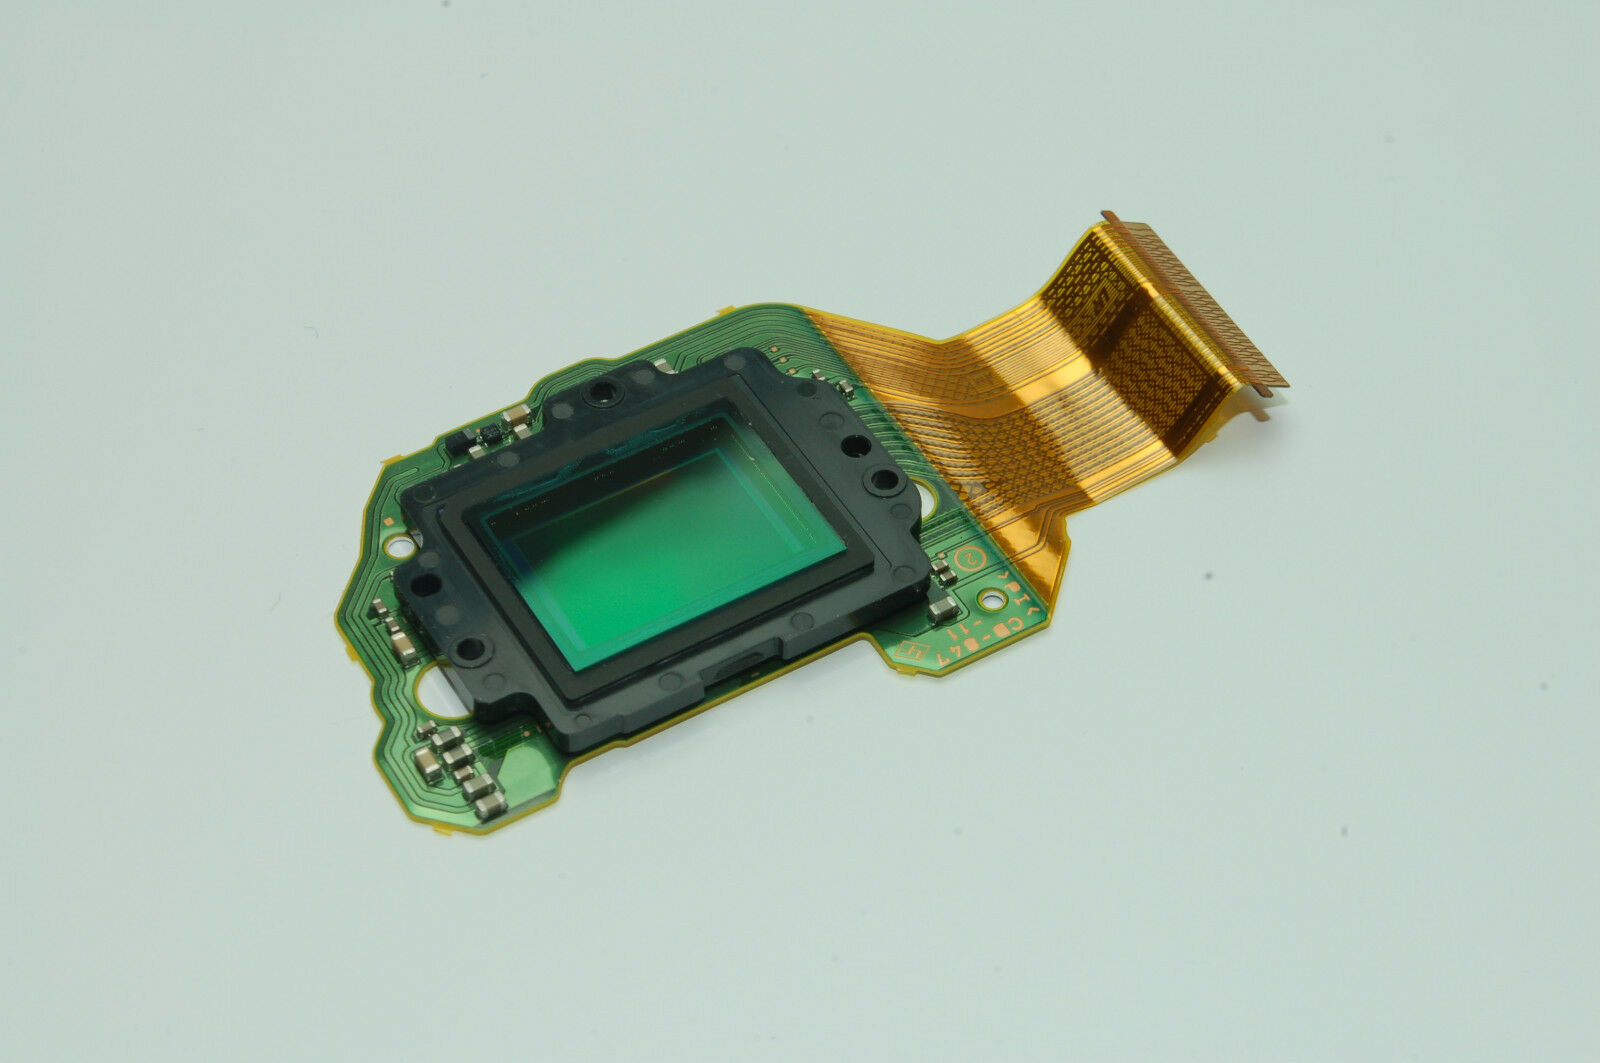 Sony NEX-F3 CCD Sensor Replacement Repair Part DH7221